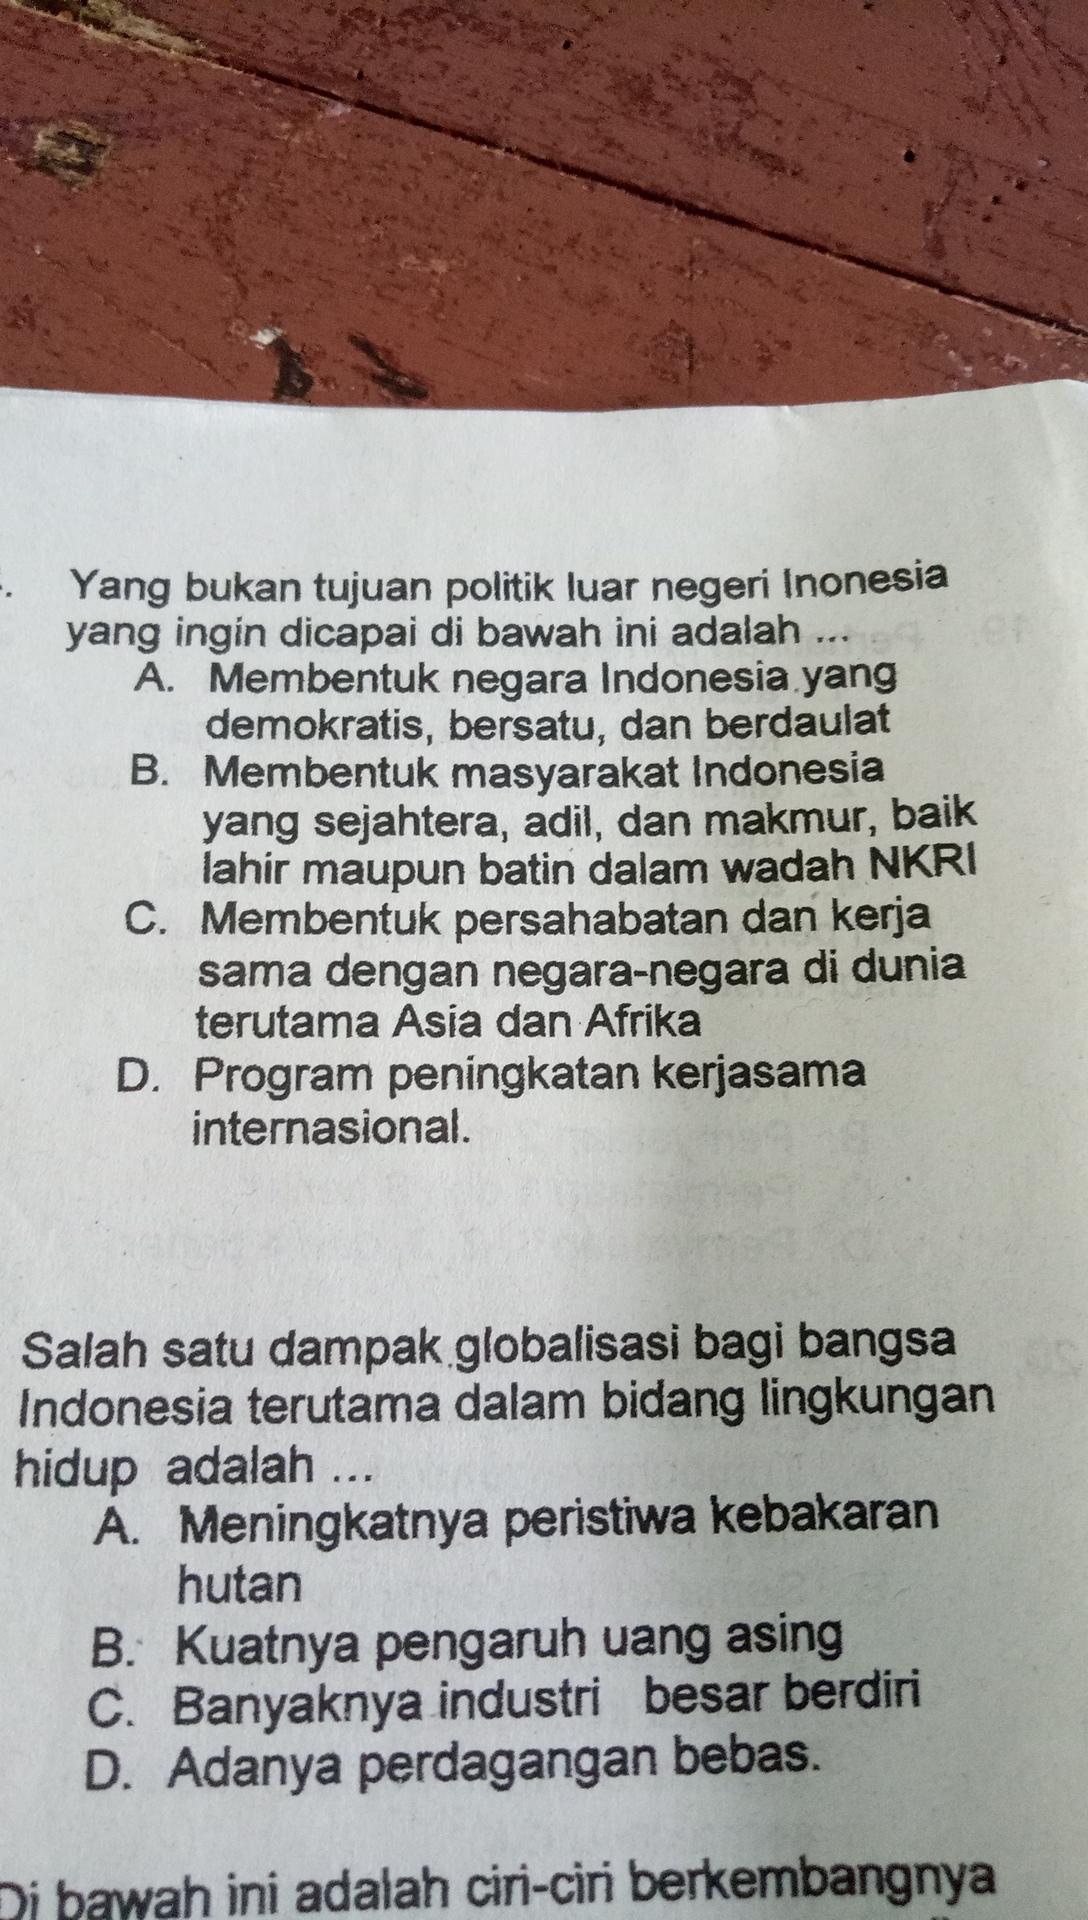 Tujuan Politik Luar Negeri Indonesia Adalah : tujuan, politik, negeri, indonesia, adalah, Tujuan, Politik, Negeri, Indone, Brainly.co.id